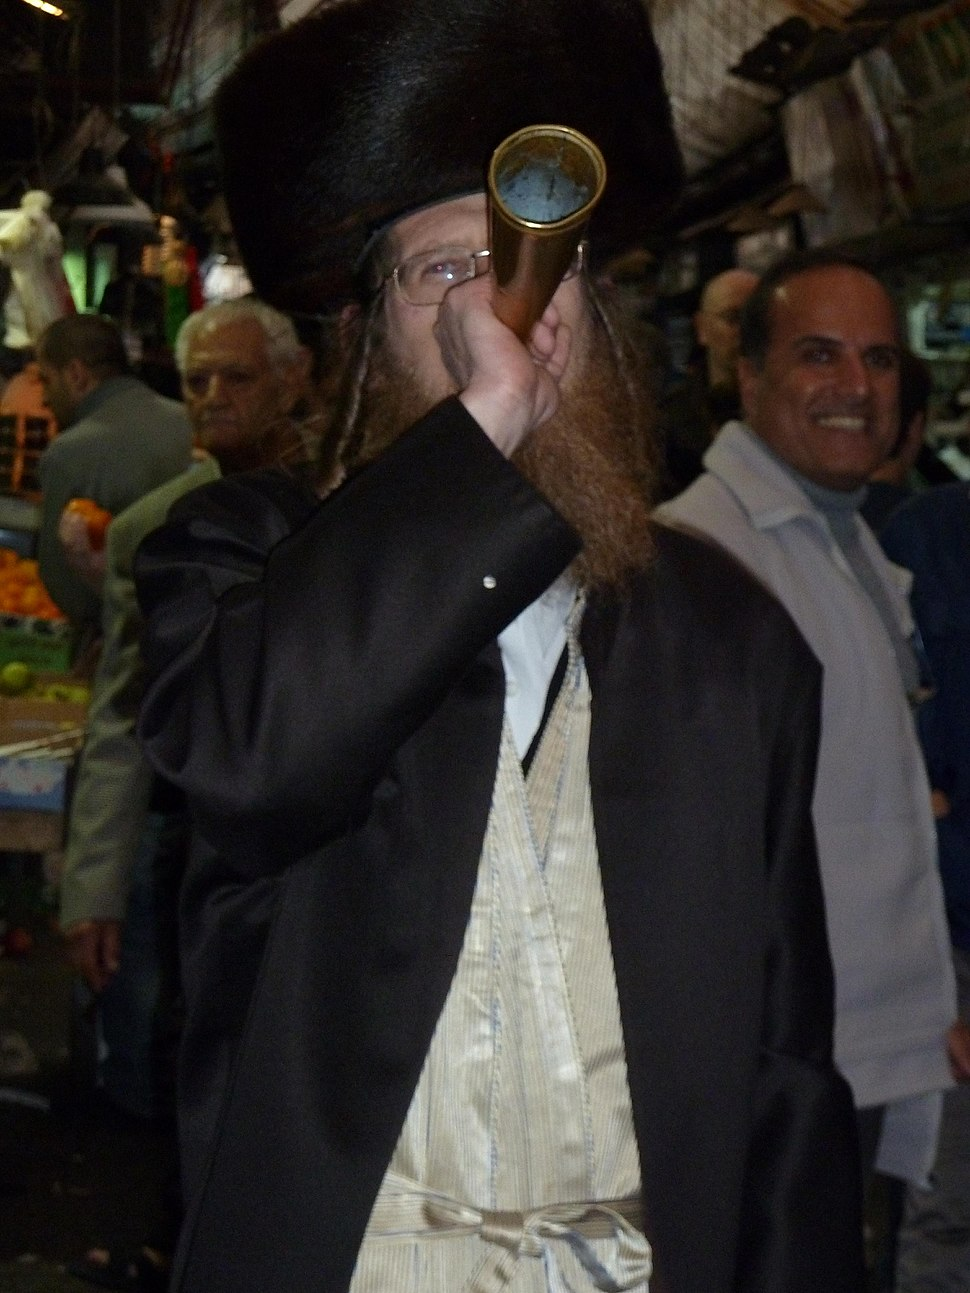 Jerusalem Mahane Yehuda Market Shabbat trumpeting